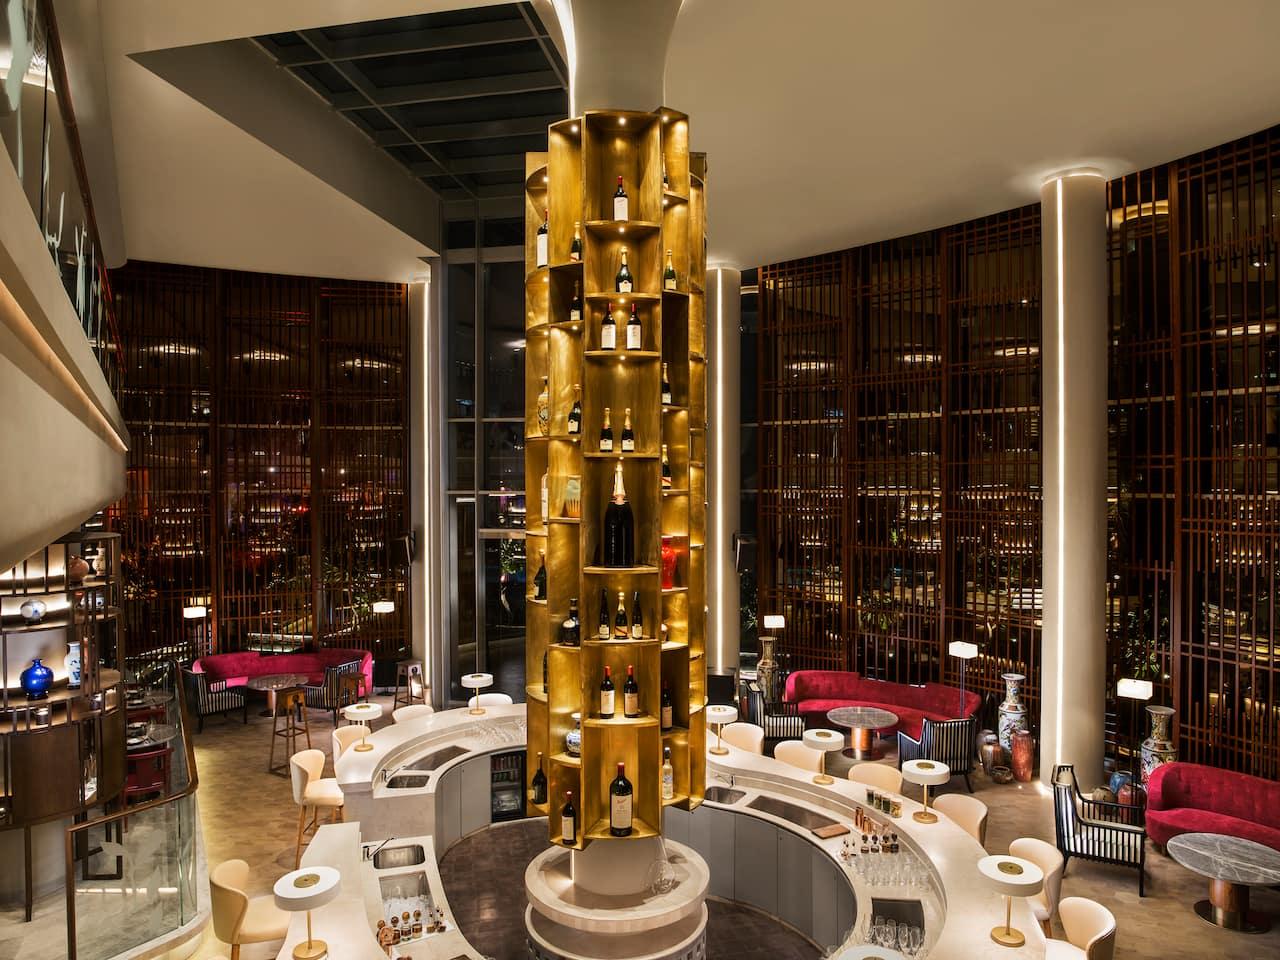 The Hong Kong Club - Top Cantonese Restaurant in Delhi